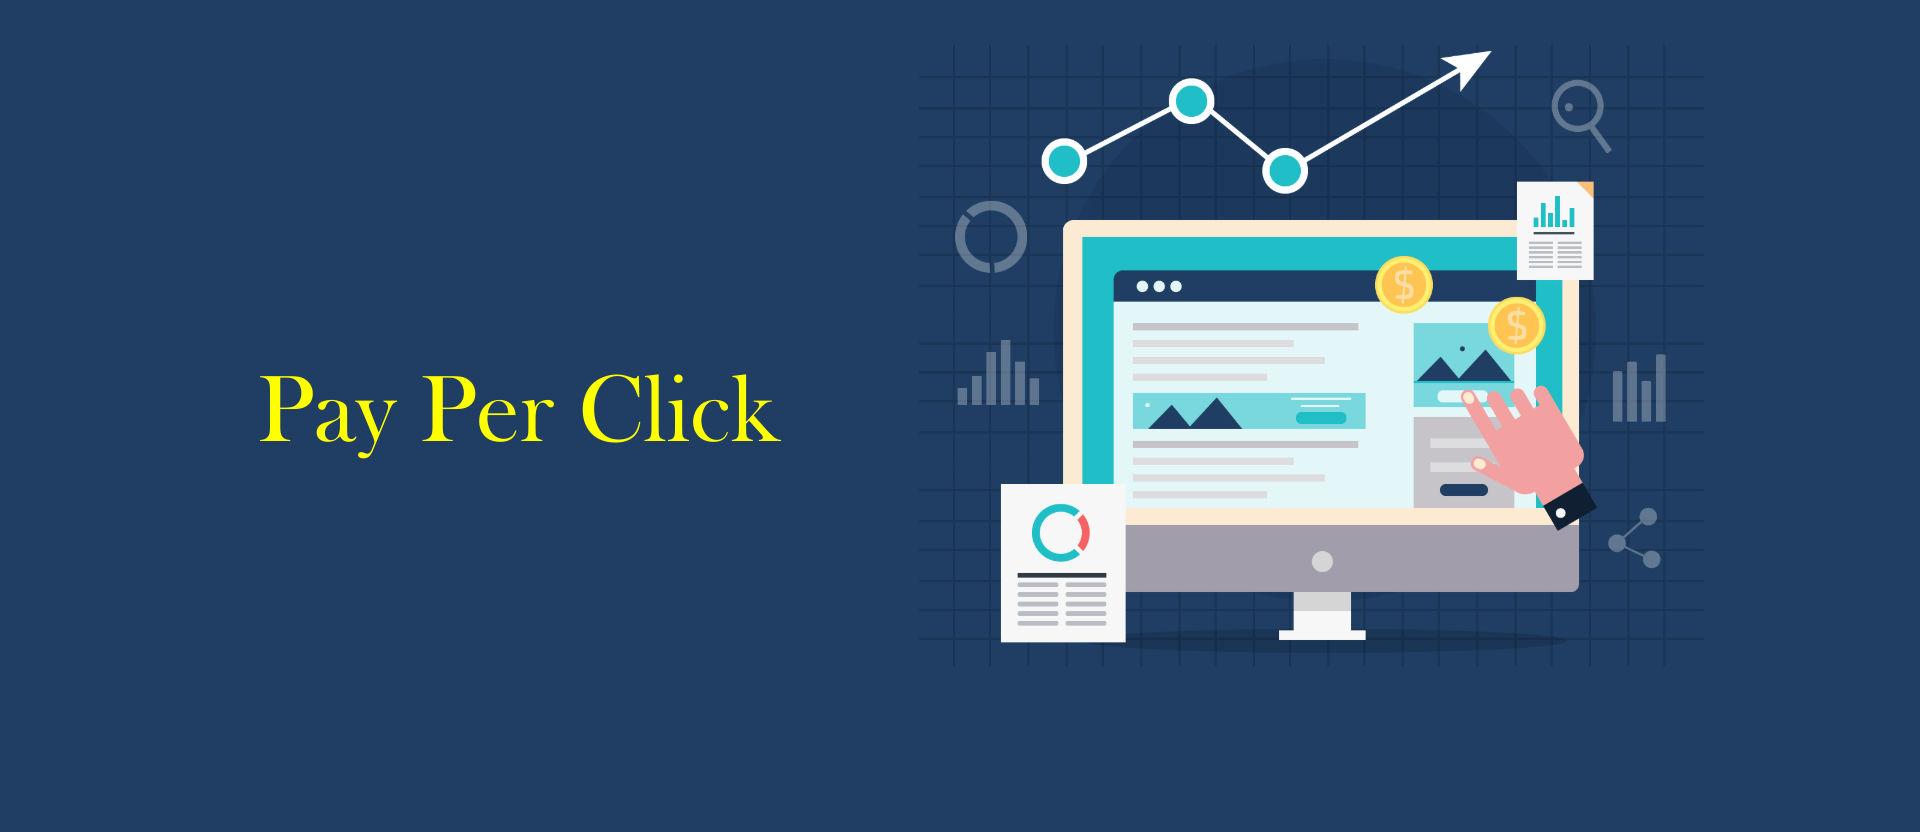 apa itu pay per click